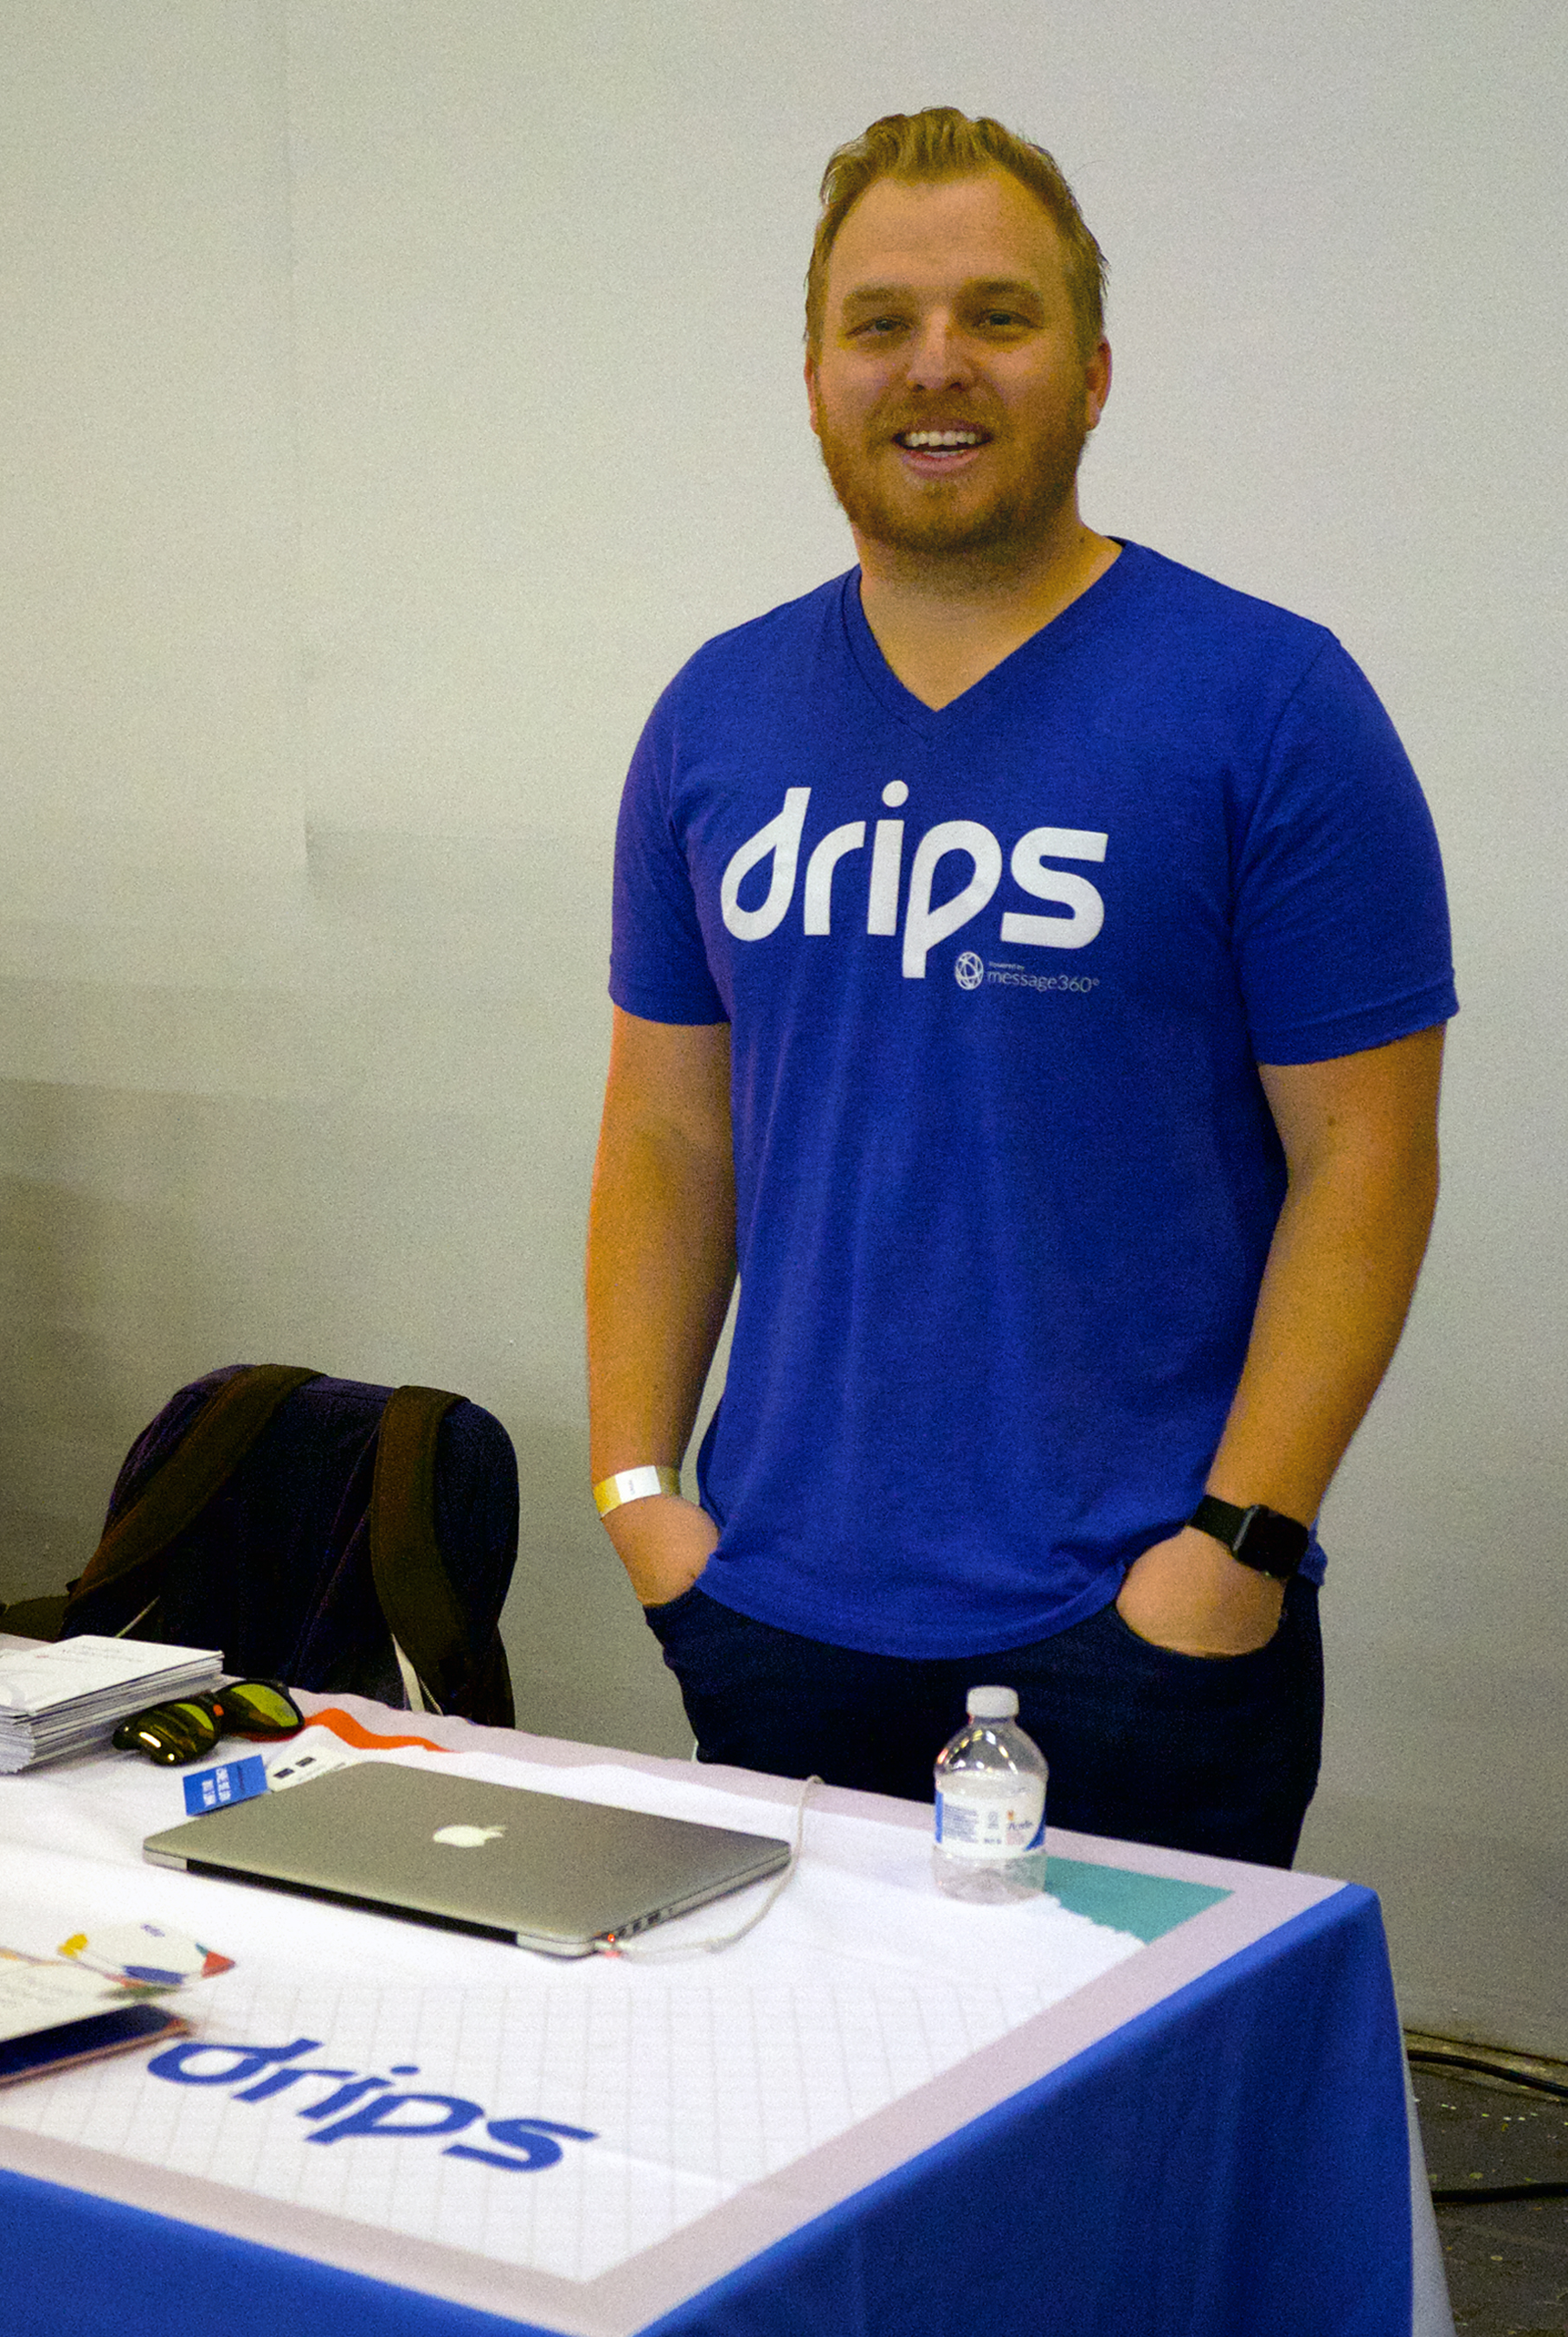 _Drips_HLK.jpg